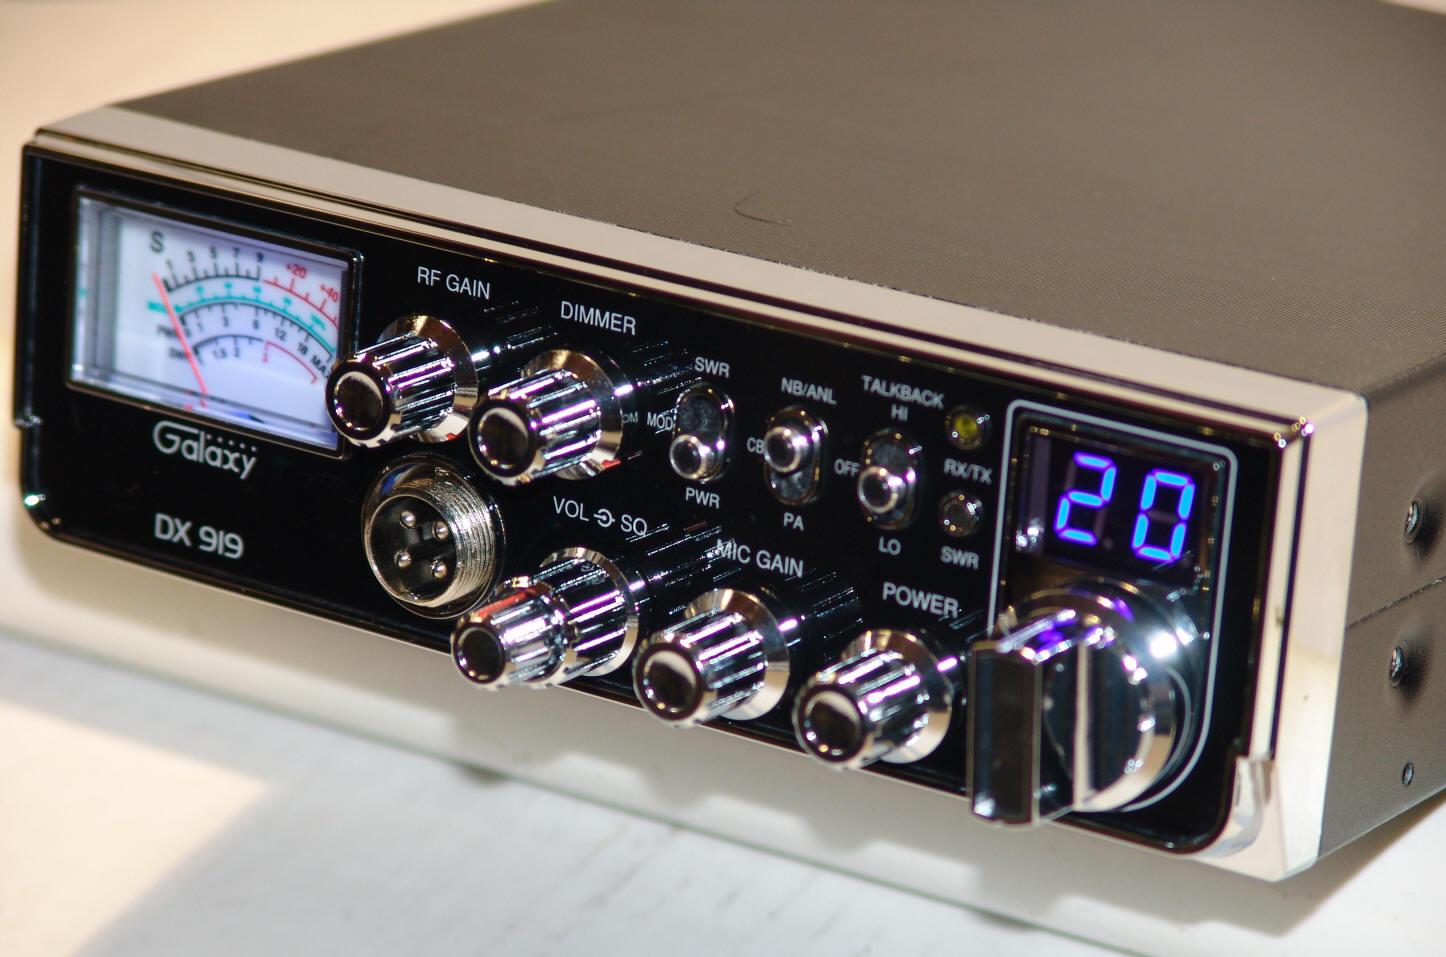 Galaxy dx99v cb radio